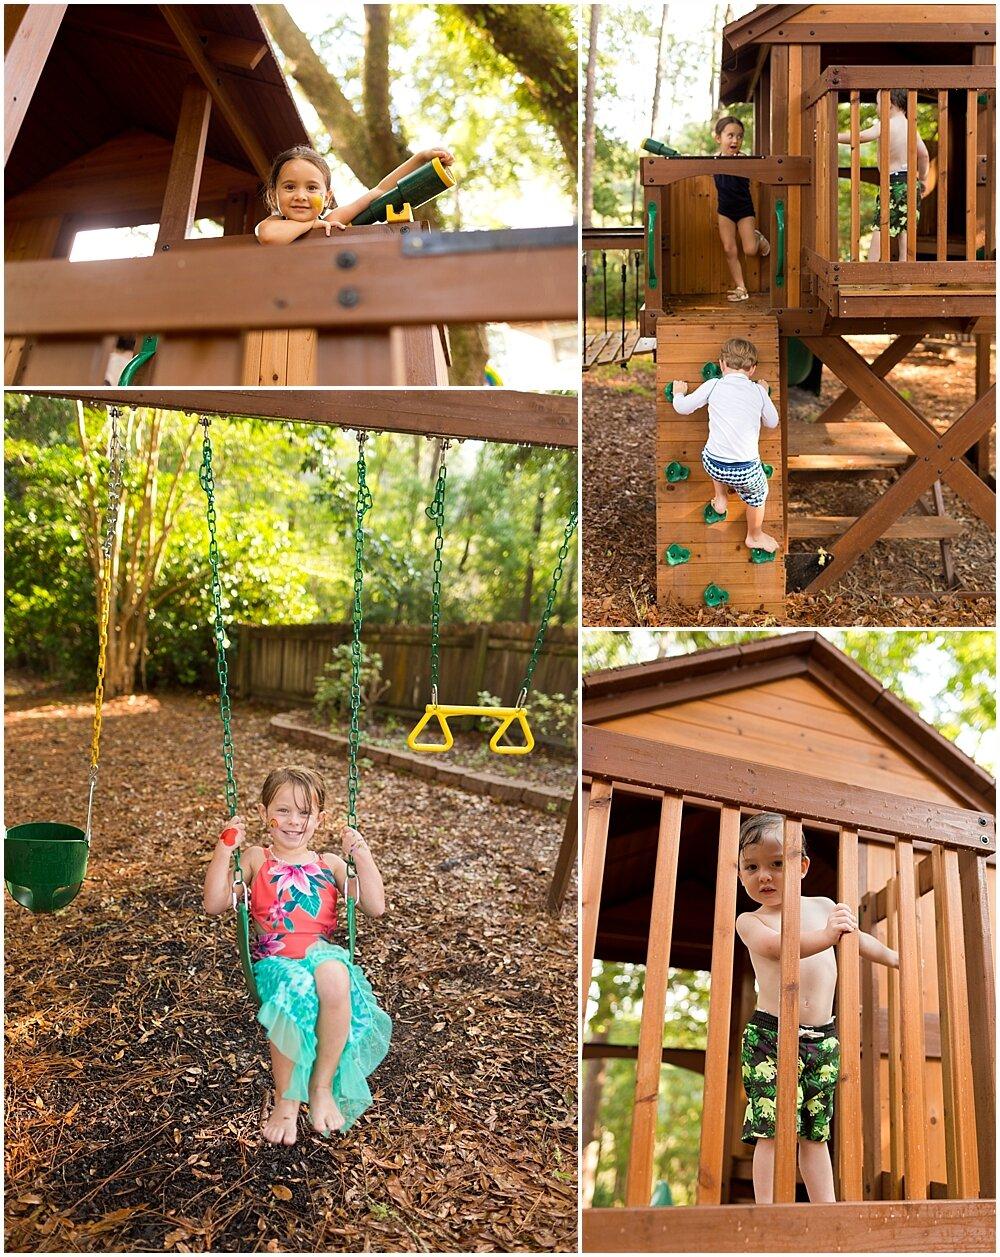 kids playing on back yard play set